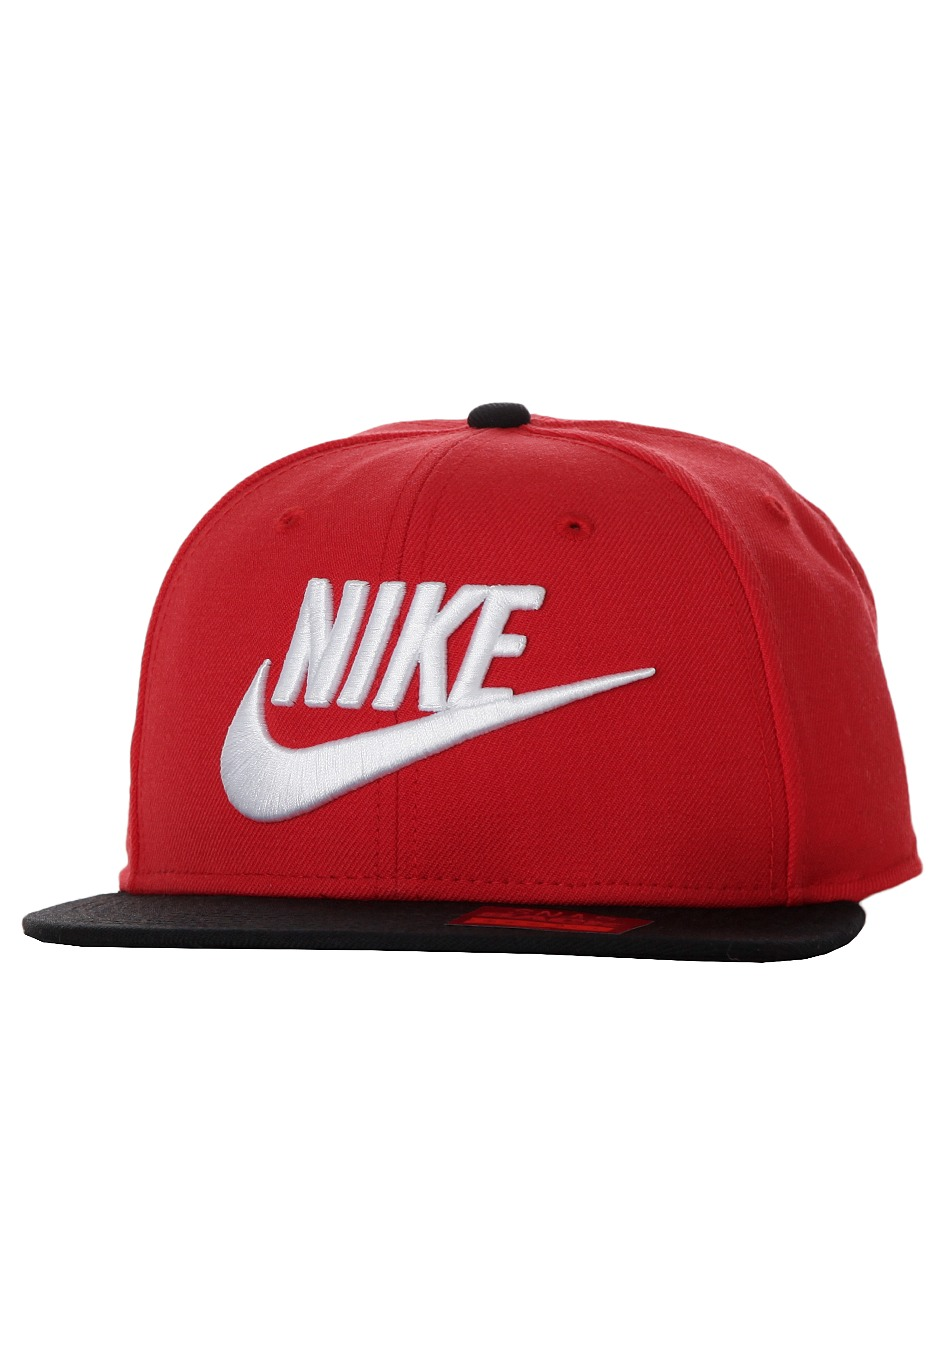 Nike - Limitless True University Red Black True White - Cap - Streetwear  Shop - Impericon.com US 0e8e5a439ab5